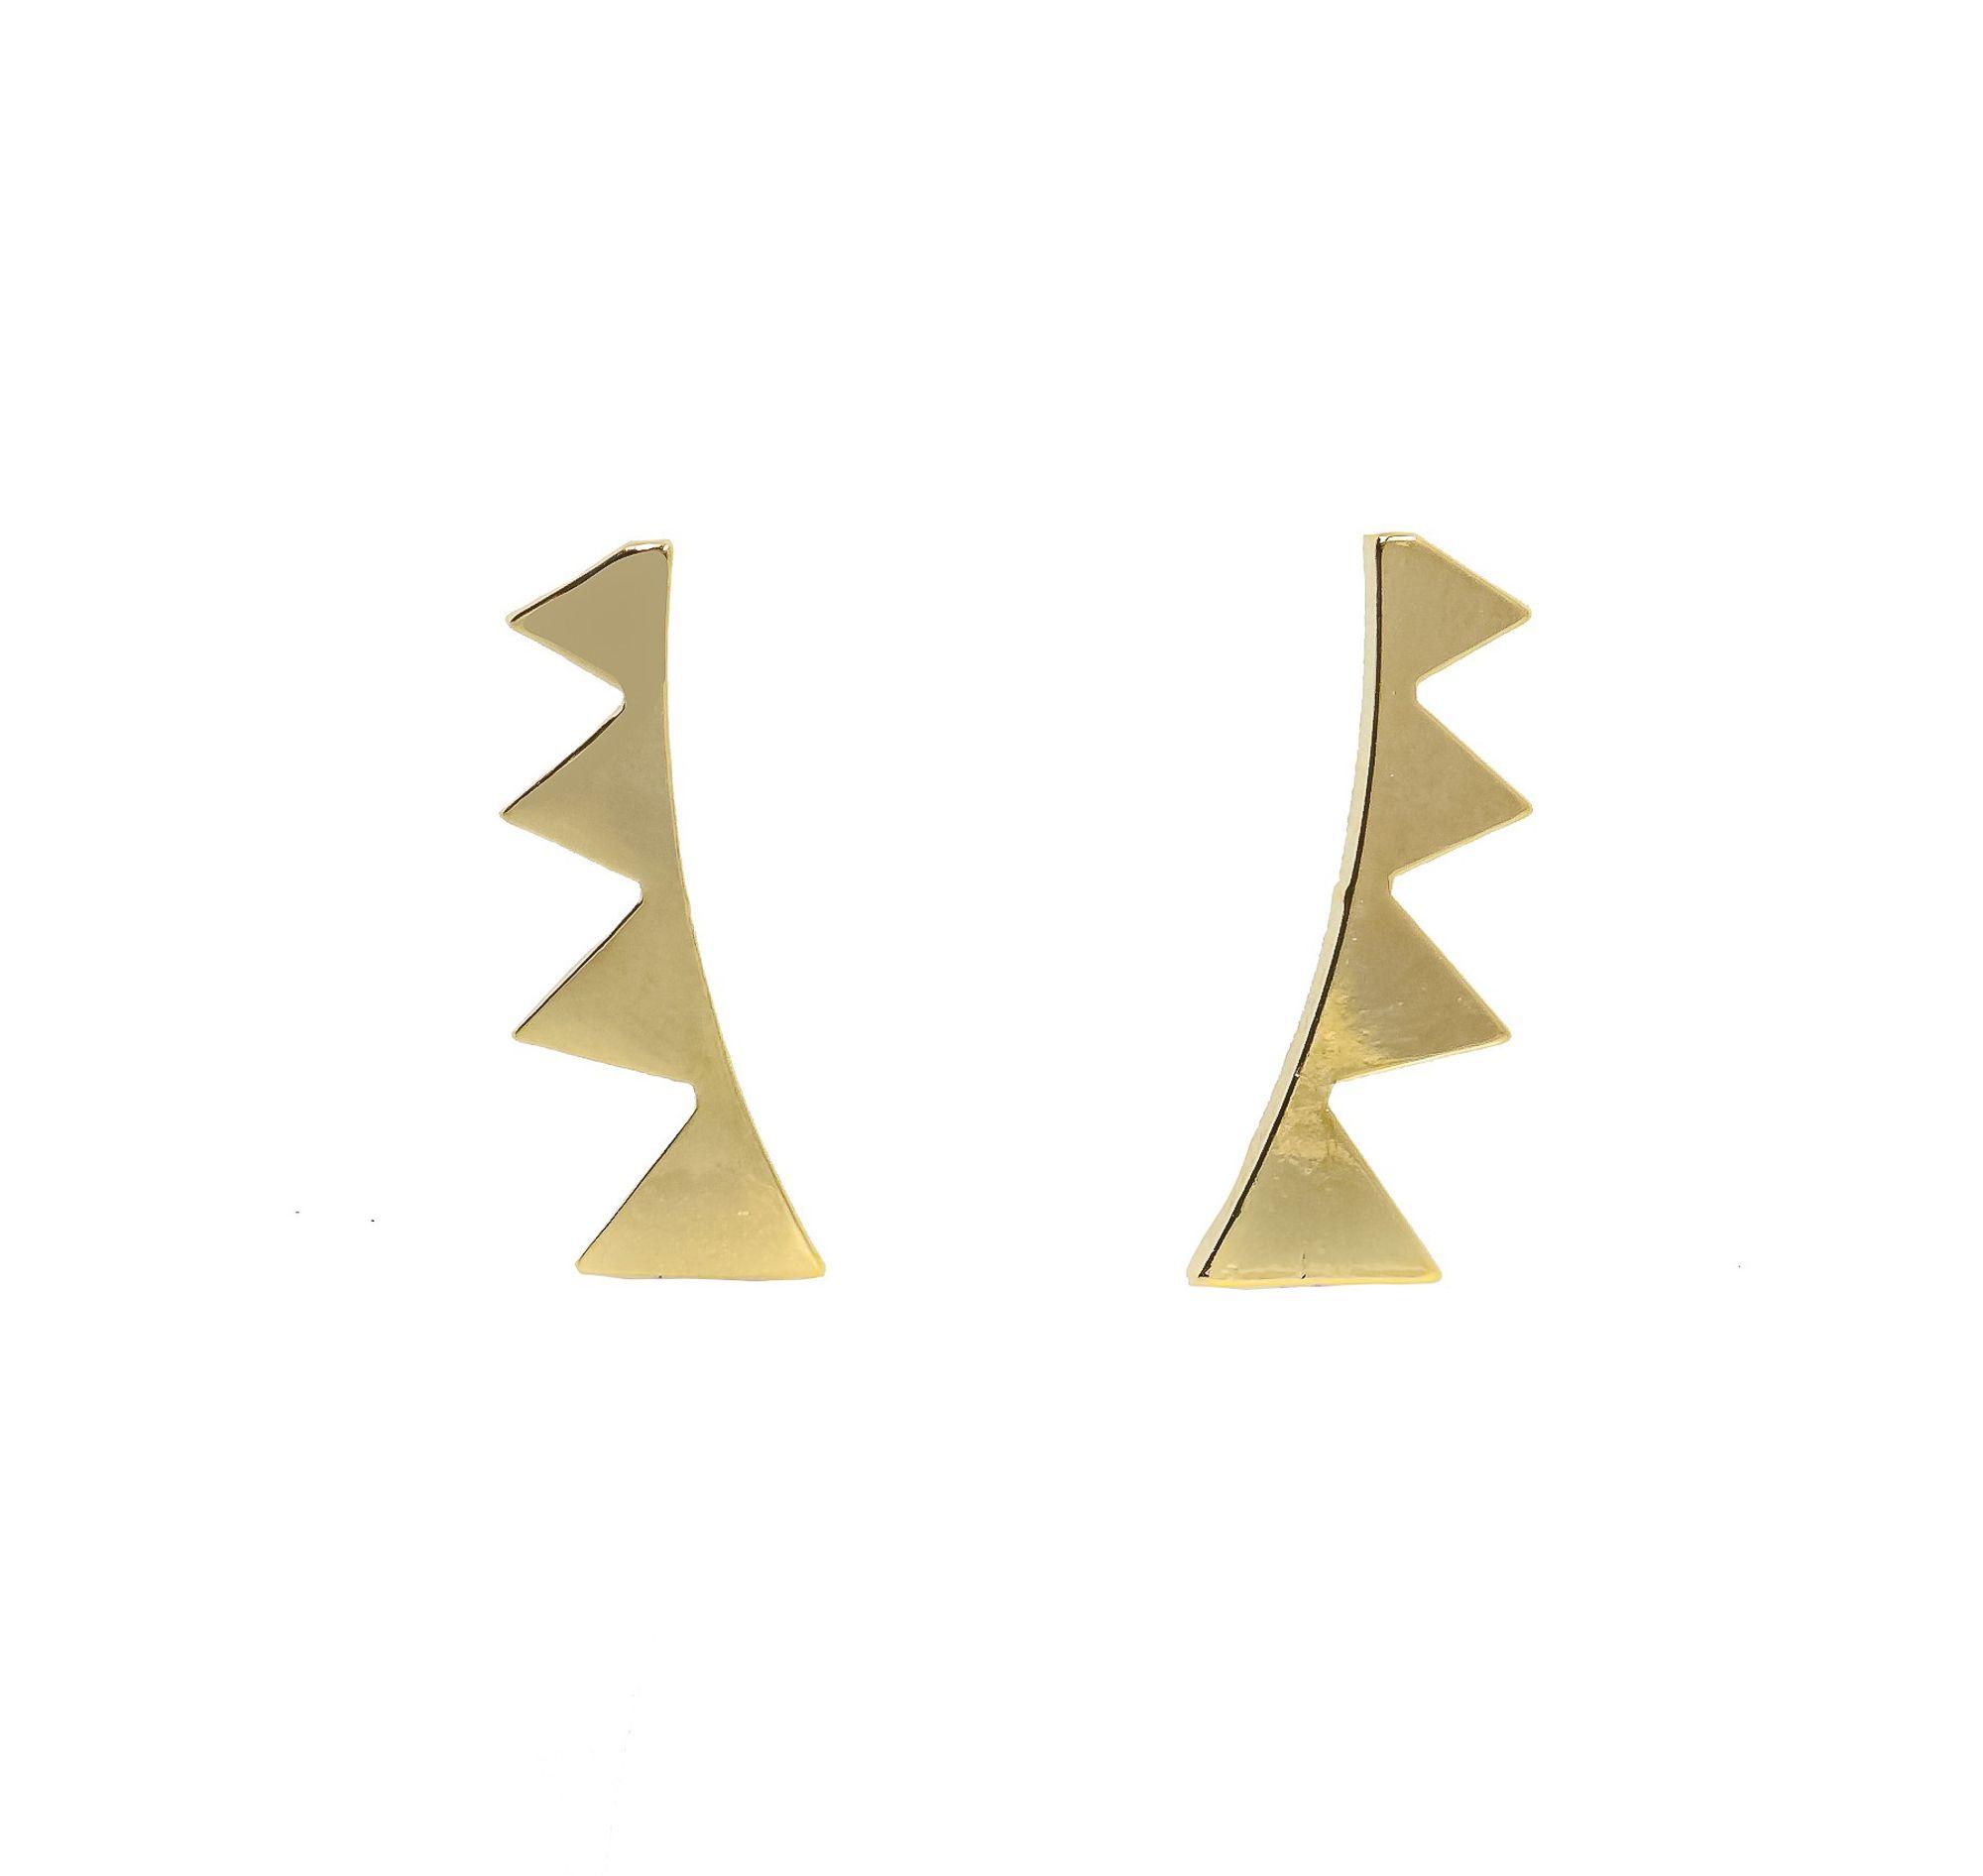 Brinco Semi joia Ear cuff Pontas folheado a ouro 18k ou rhodium